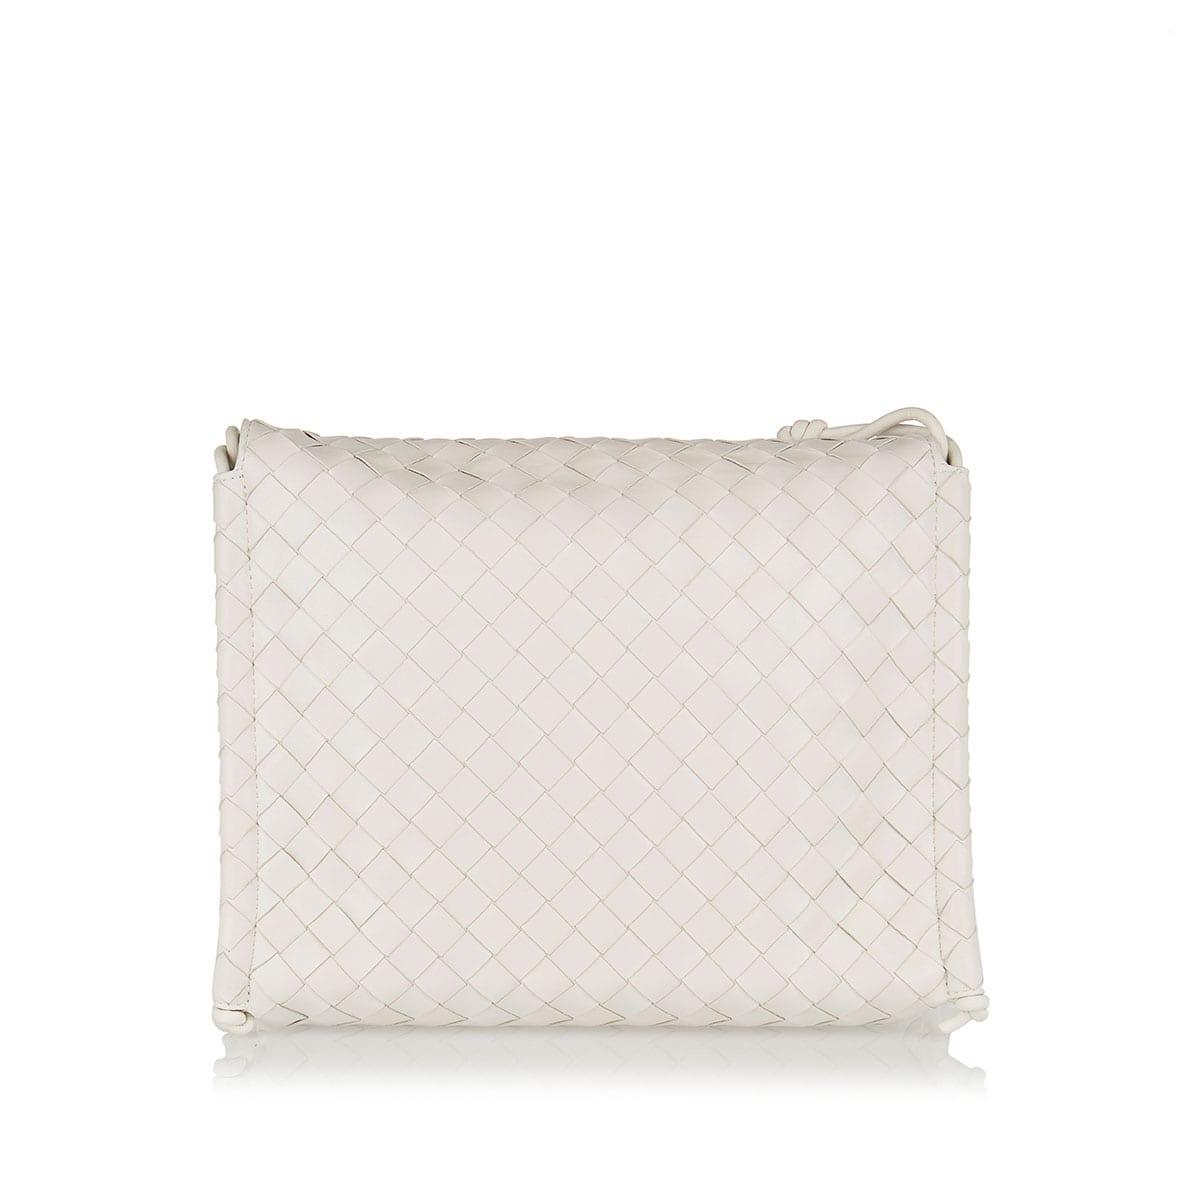 BV Fold Medium Intrecciato bag